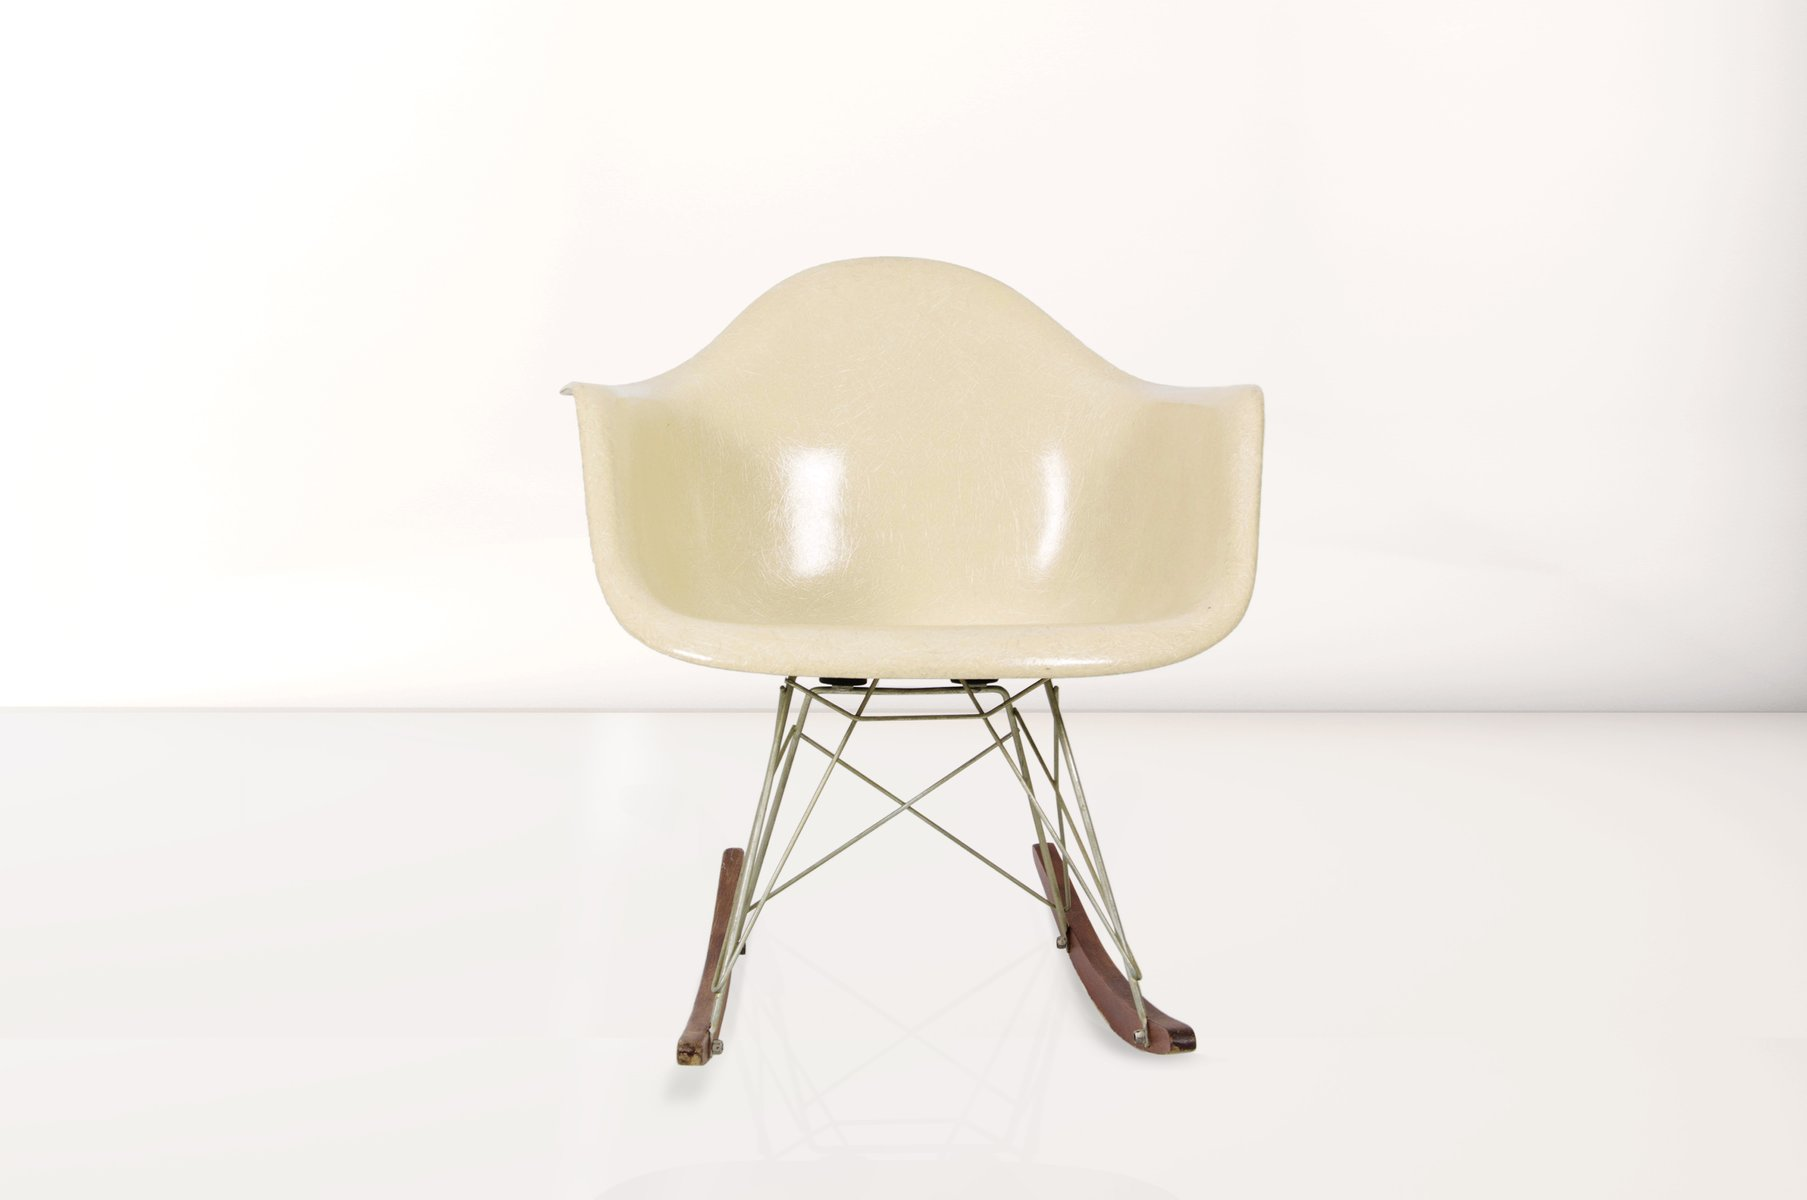 Sedia A Dondolo Rar Eames : Sedia da dondolo rar di charles & ray eames per herman miller anni